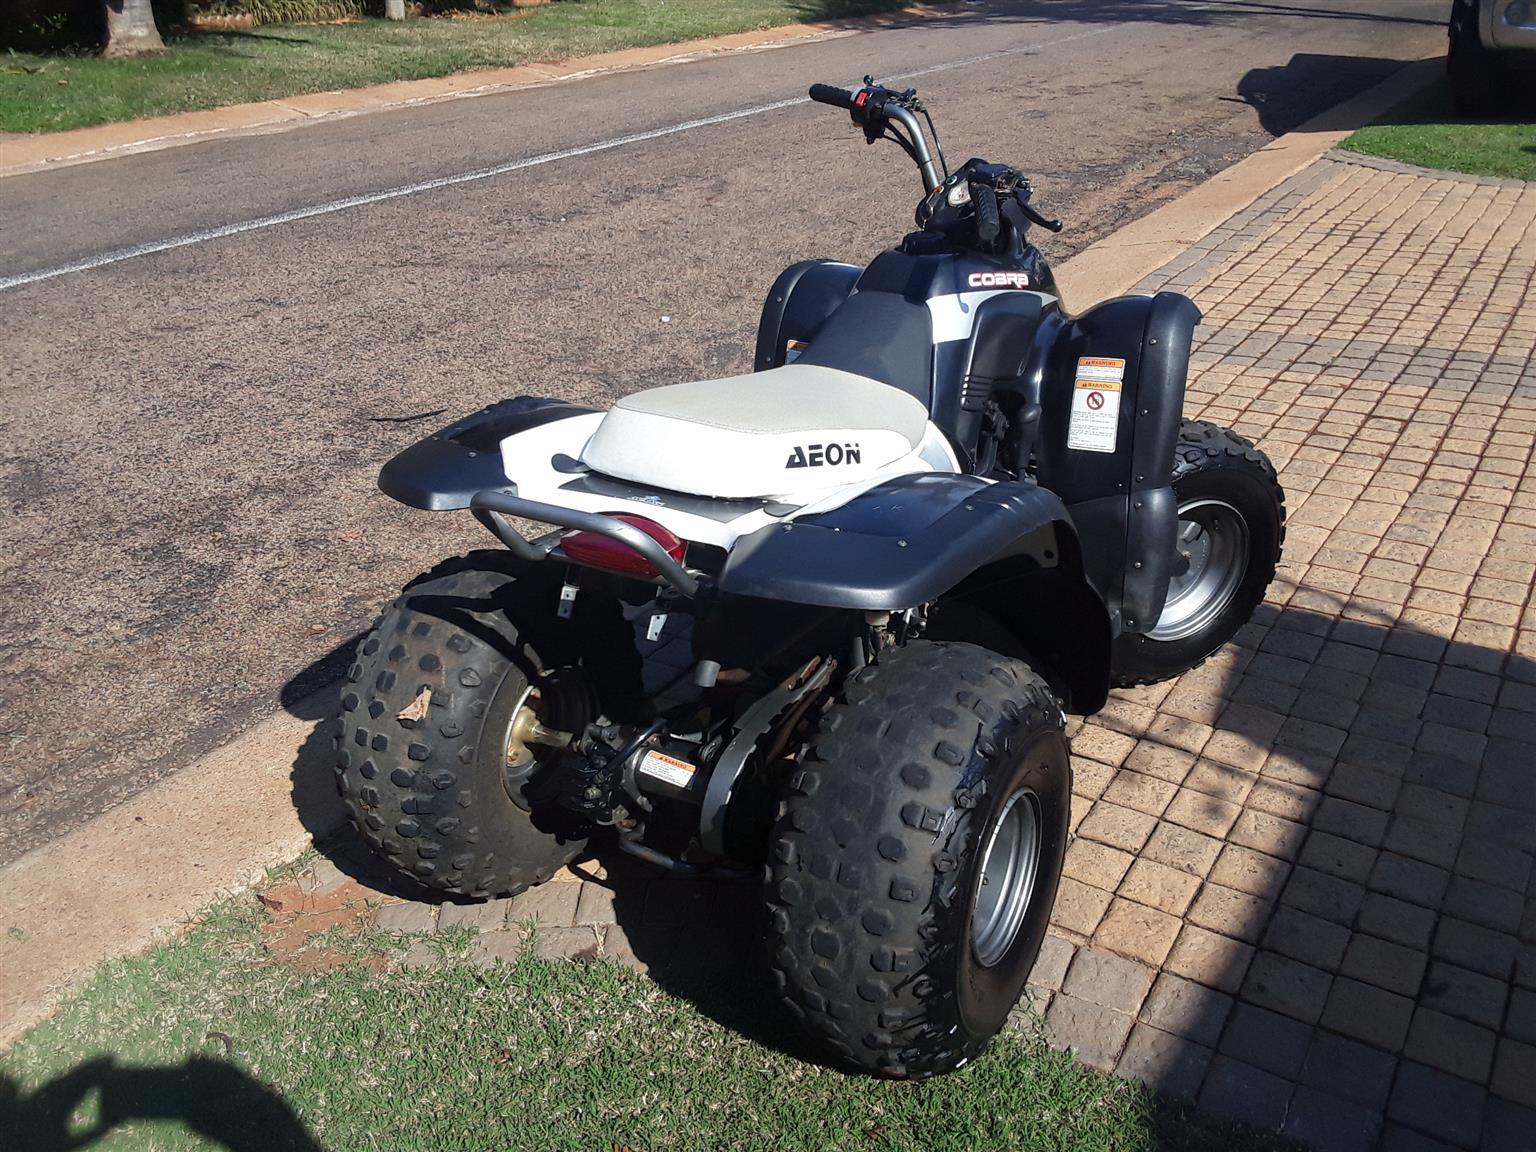 Quadbike Aeon 180 cc